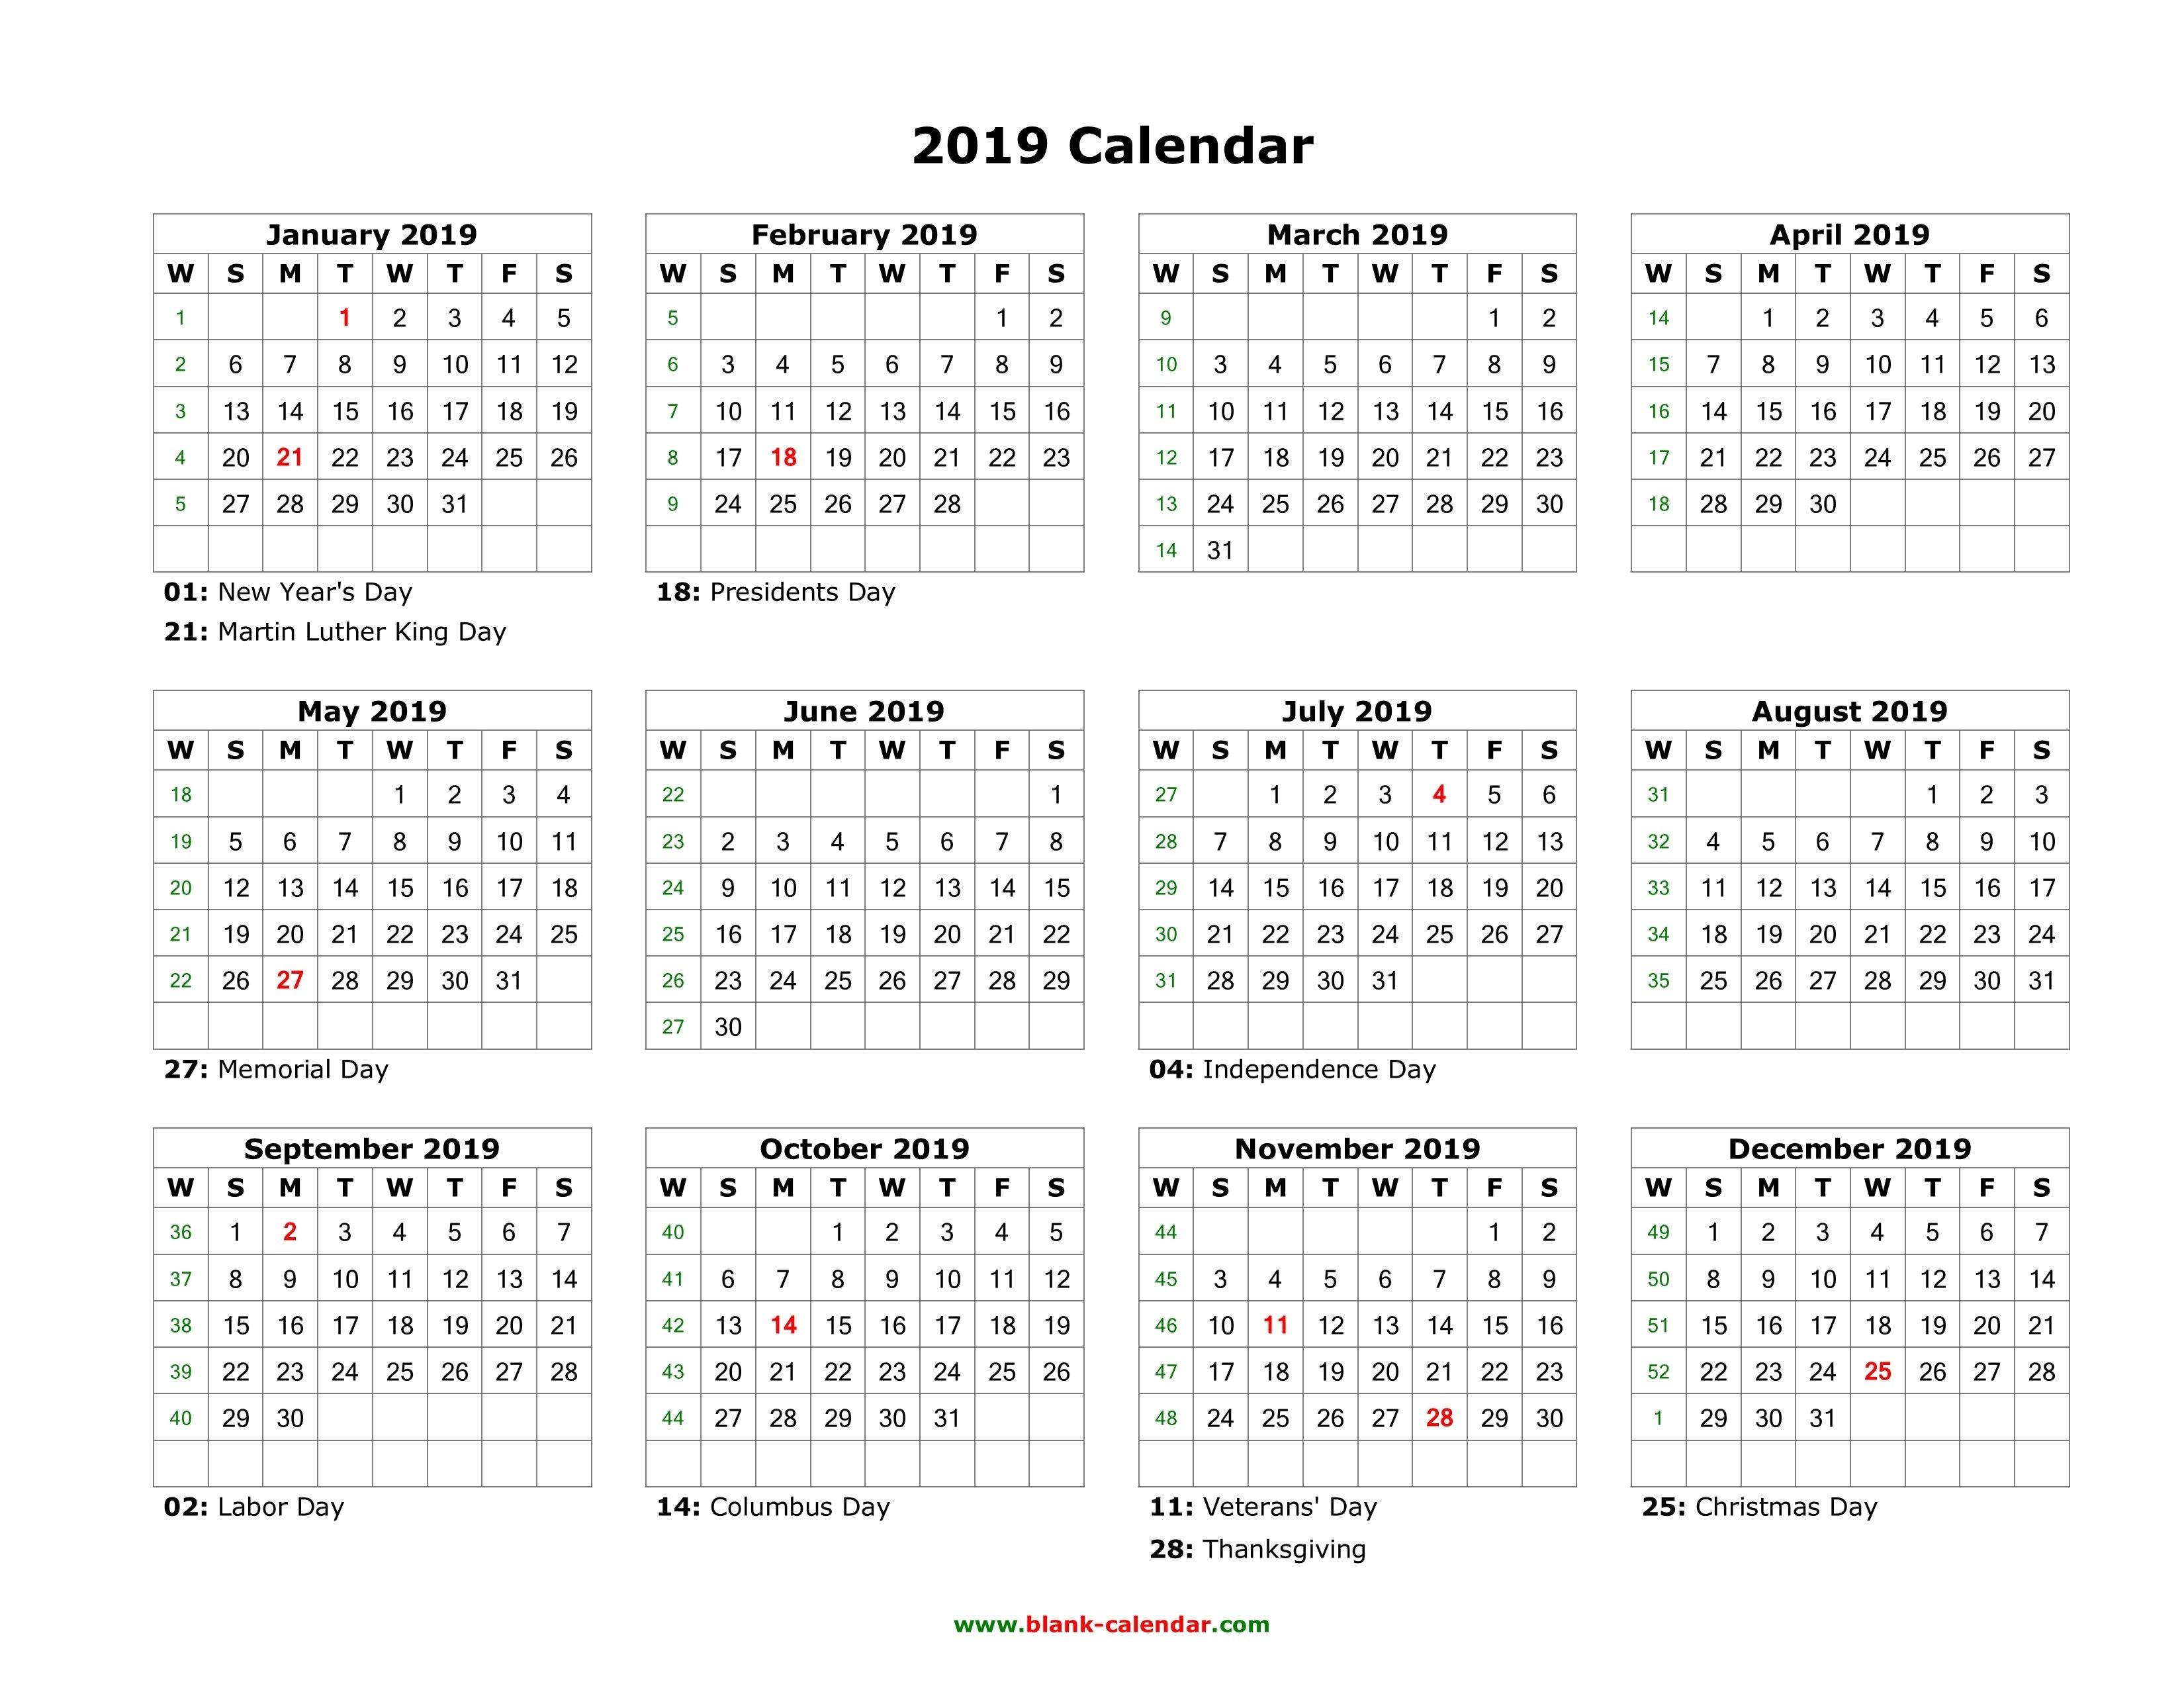 Blank Calendar 2019 | Free Download Calendar Templates Calendar 2019 Annual